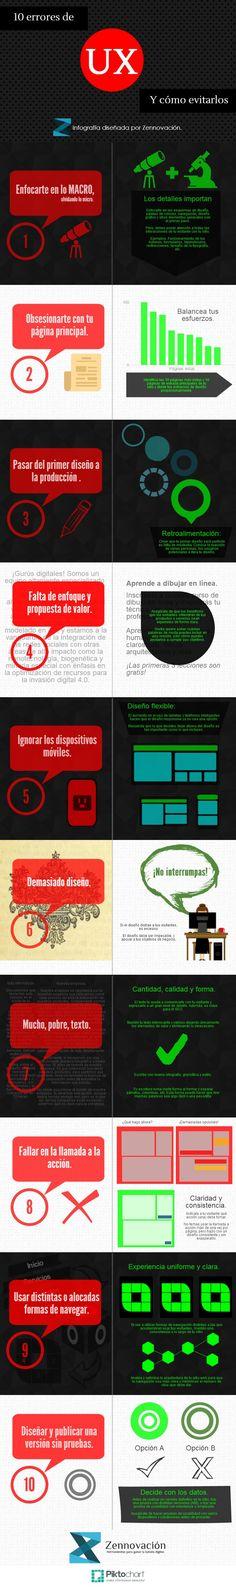 Hola: Una infografía con 10 errores en experiencia de usuario. Un saludo Courtesy of: Zennovación